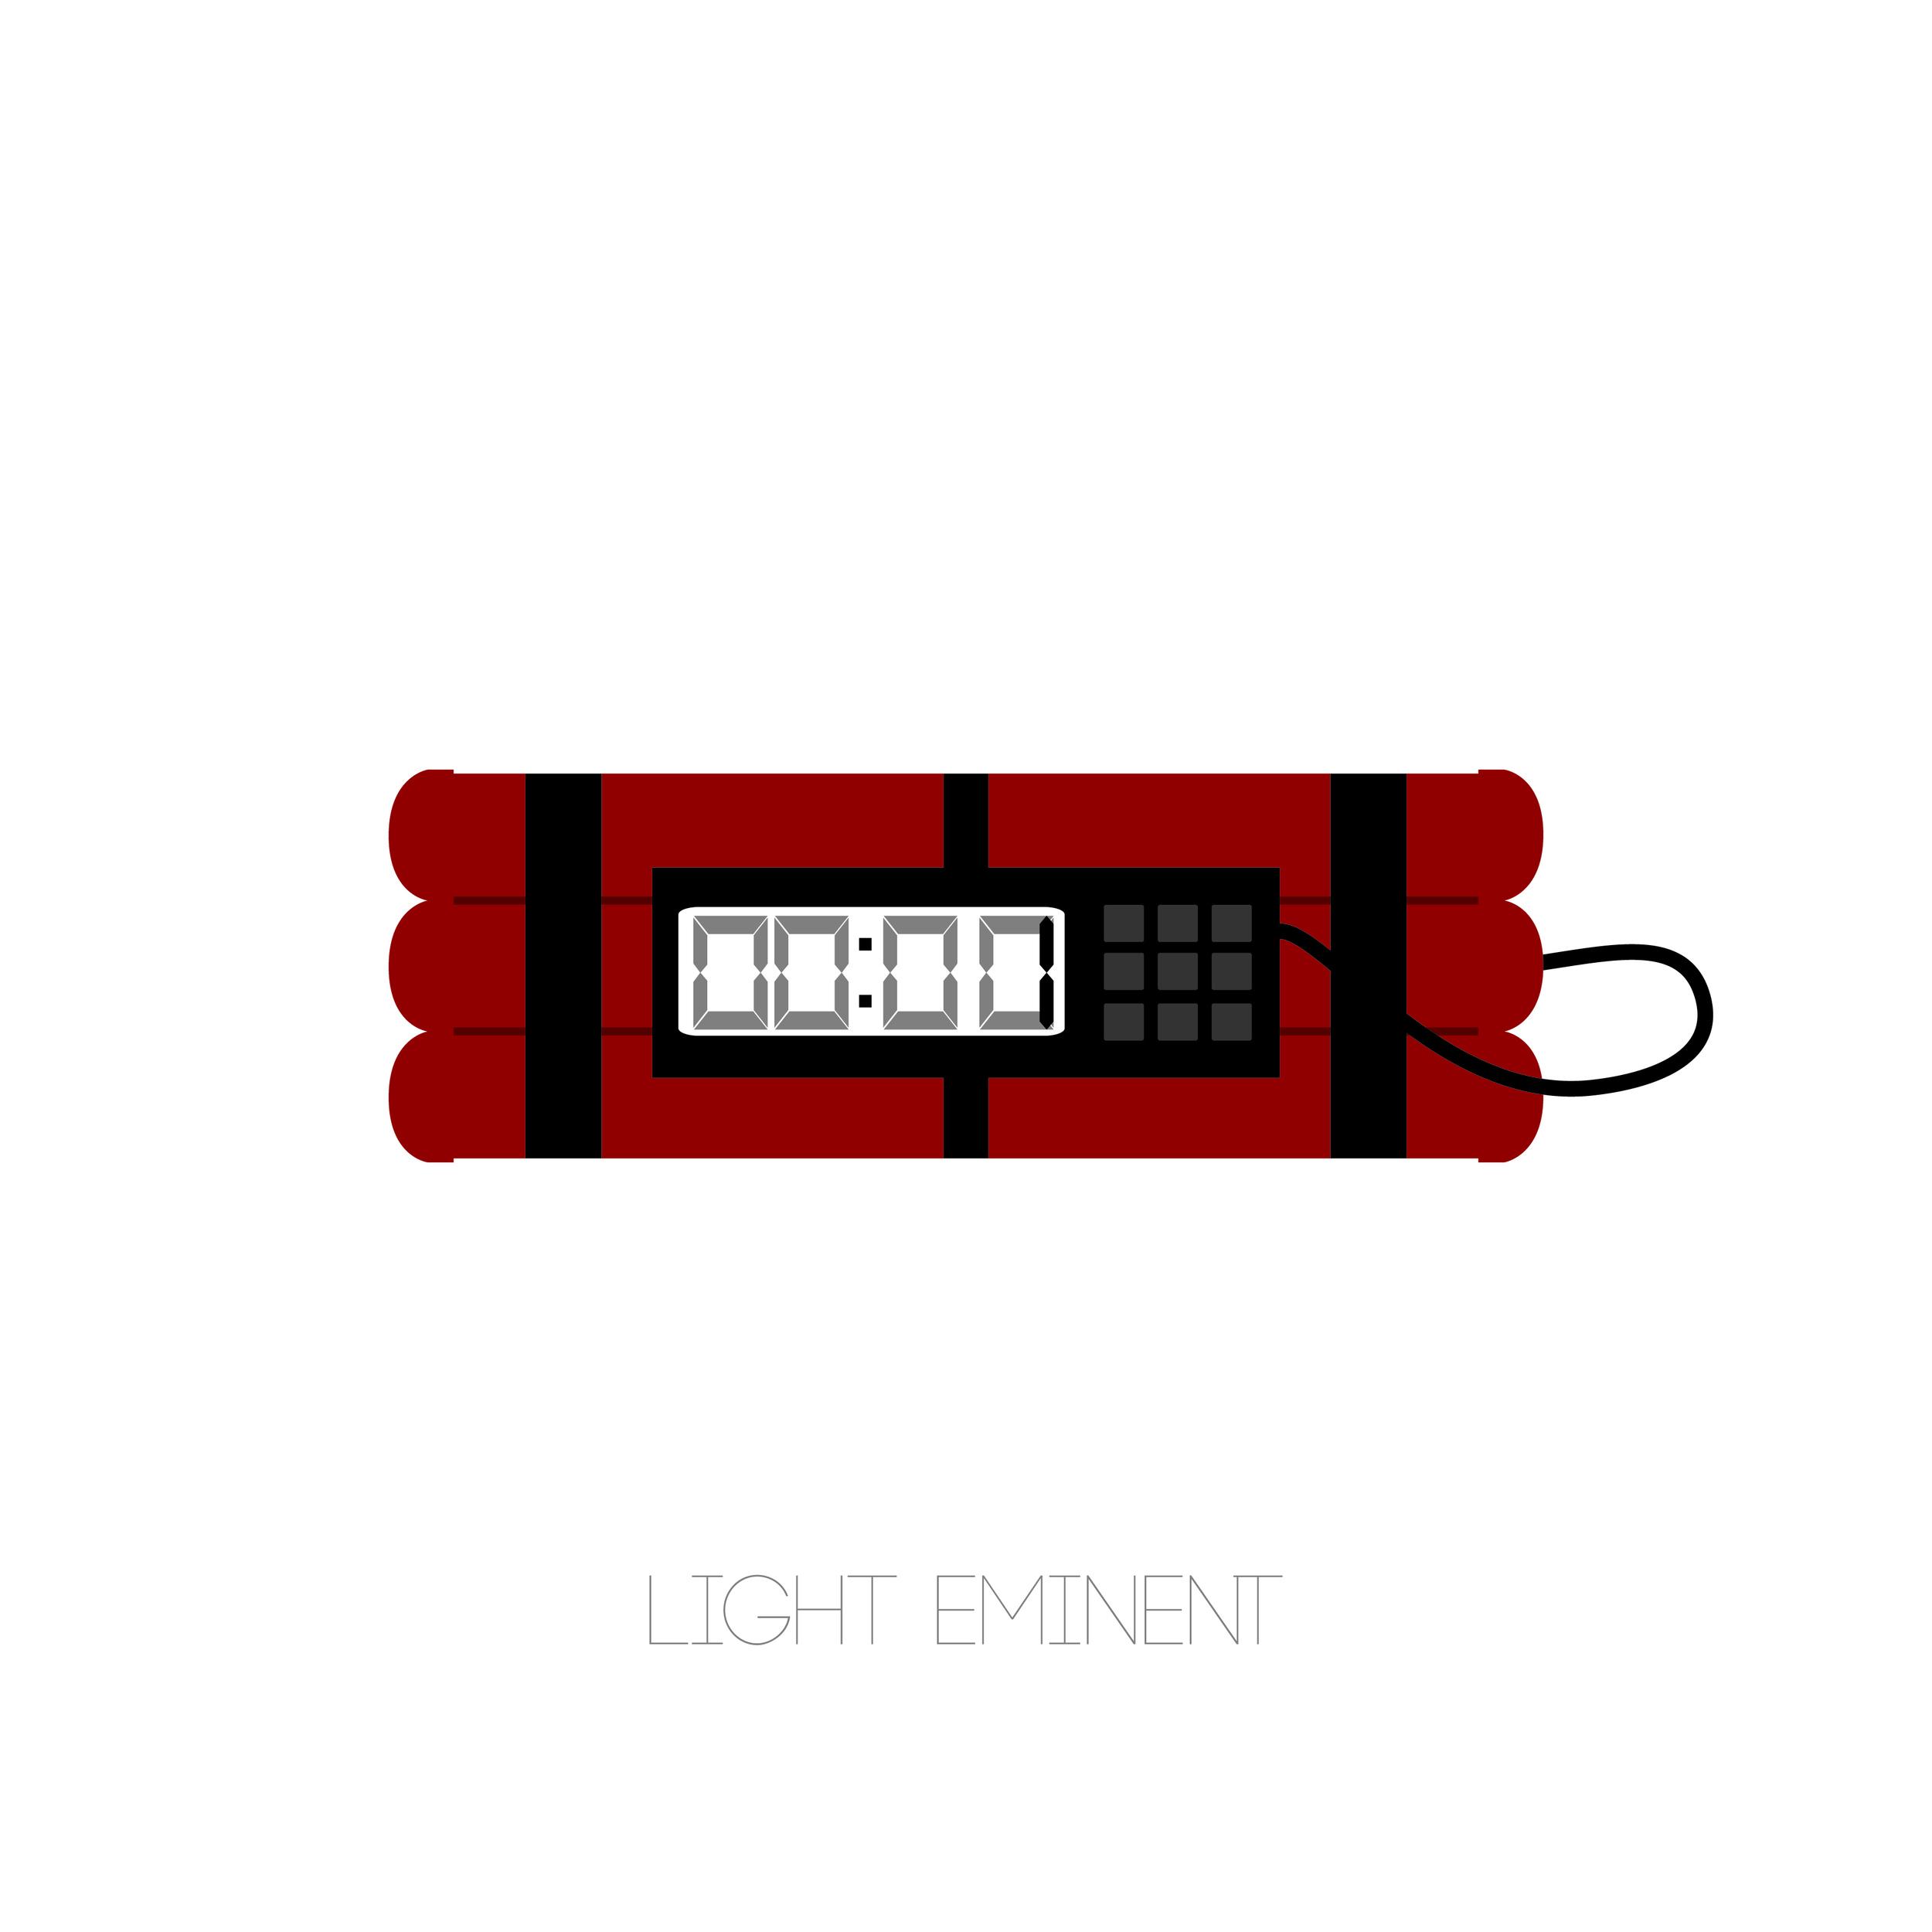 12x12 light.jpg